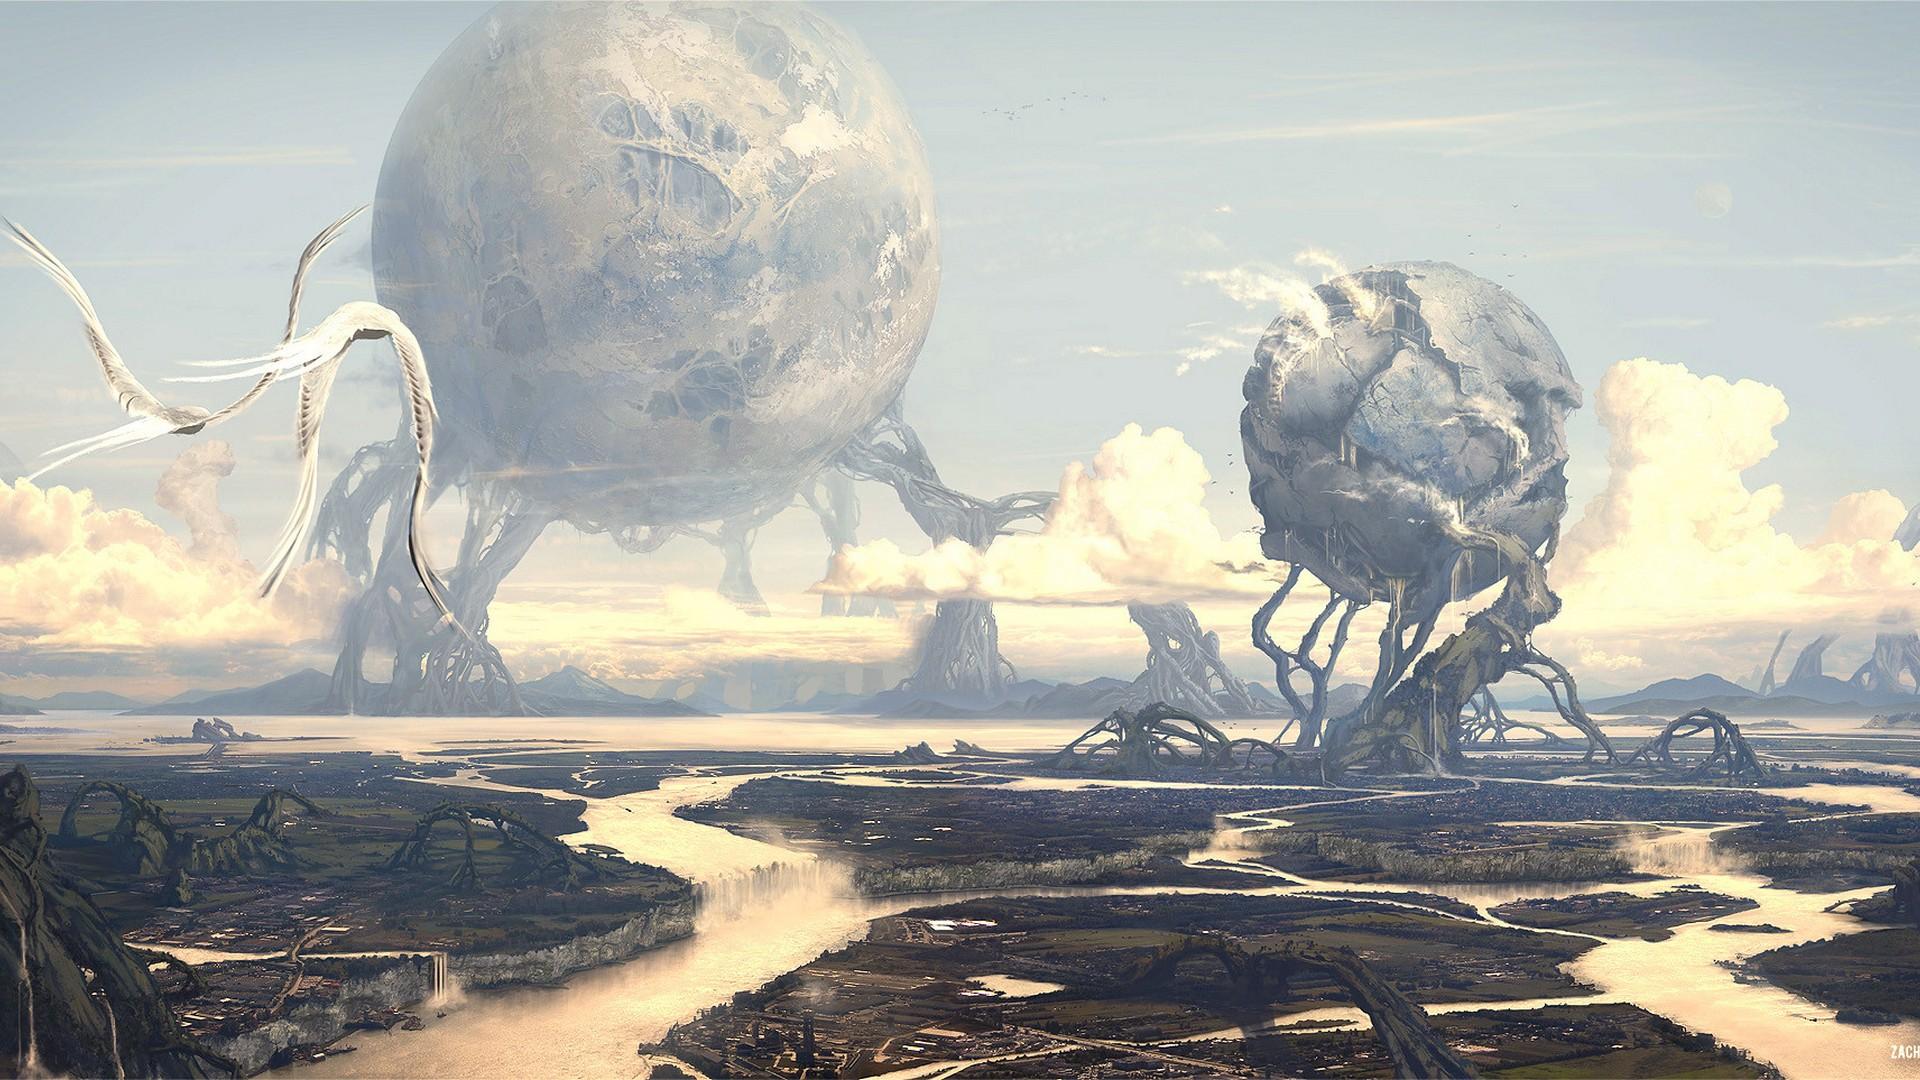 Best Fantasy Art Wallpaper Hd With High-resolution - Fantasy World - HD Wallpaper